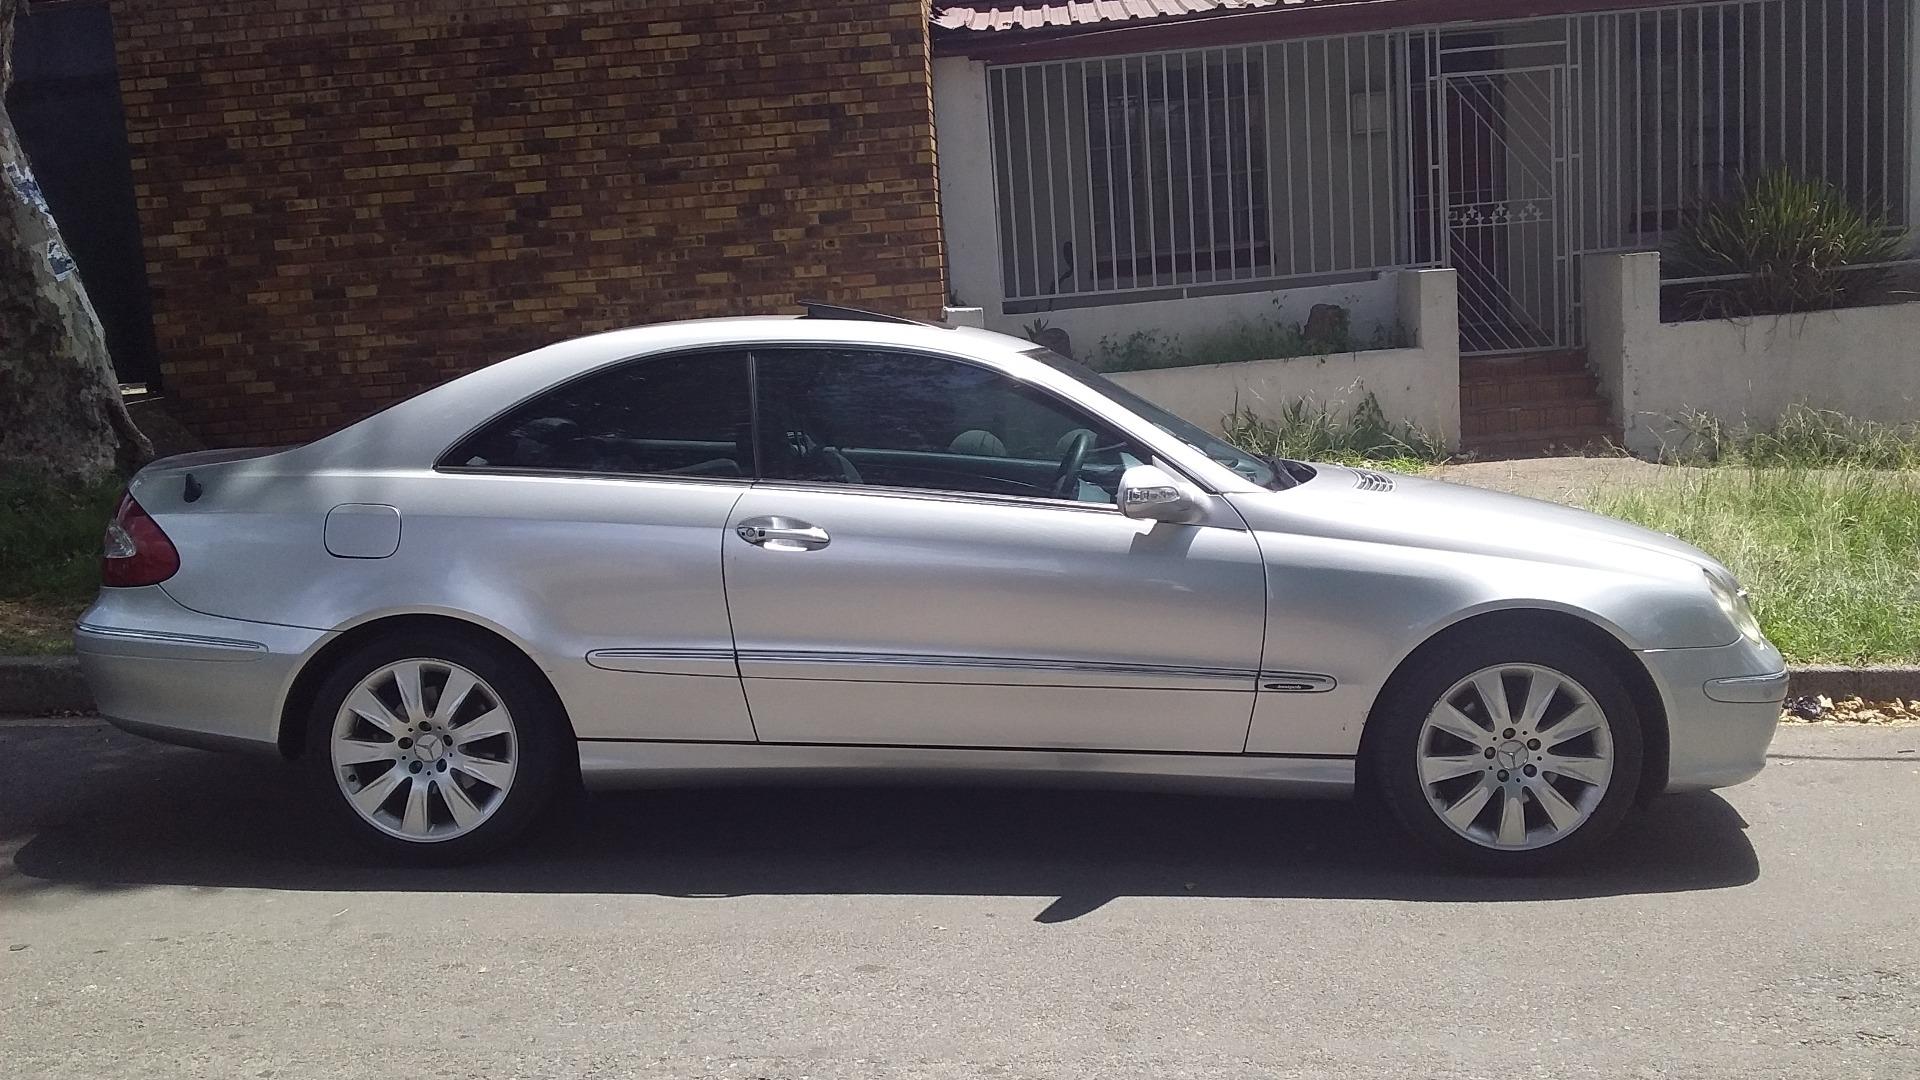 Mercedes Benz CLK CLK320 cabriolet Avantgarde for sale in ...